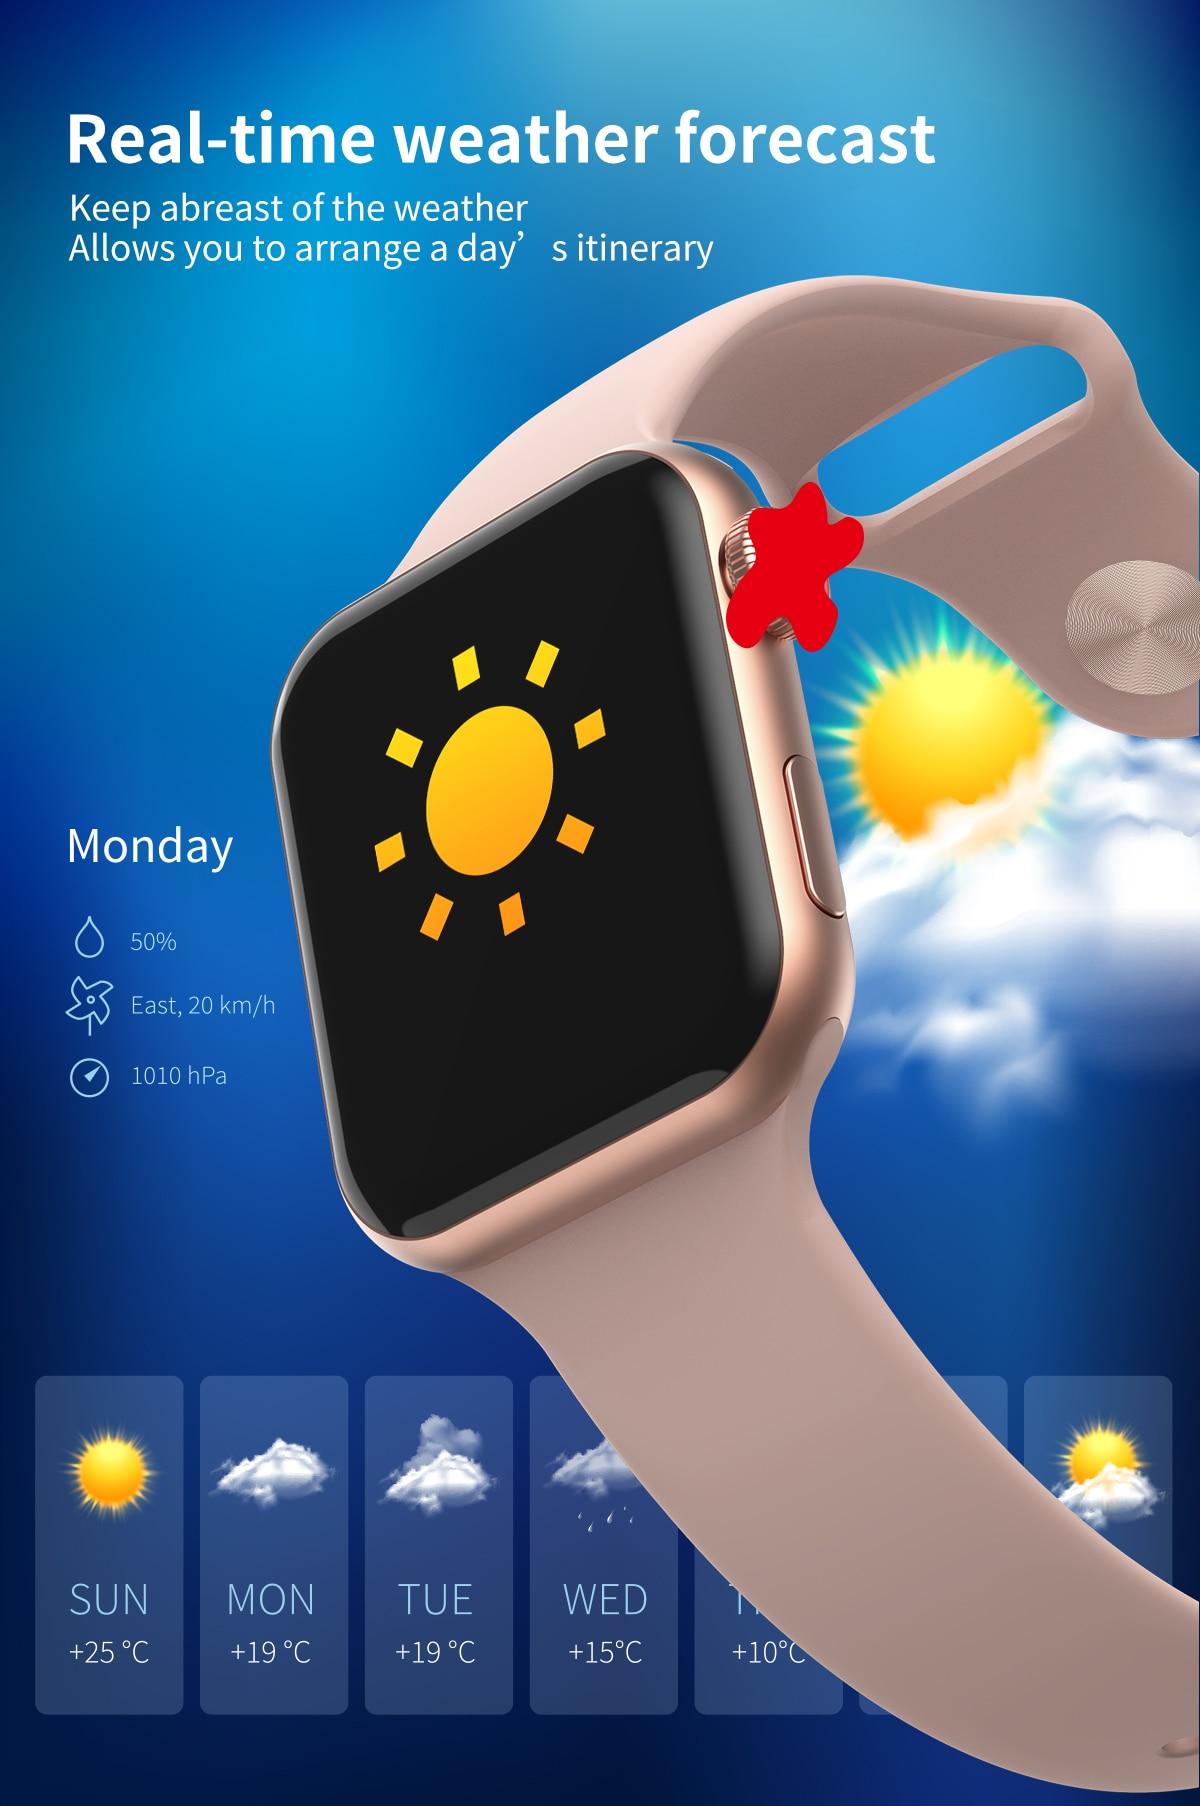 H82be578beb224ecfa2ca7e1fed8b6de3Z 696 New Style F10 Smart Watch Full touch screen Bluetooth Smartwatch Music Camera Heart Rate Monitor Waterproof Smart Bracelet